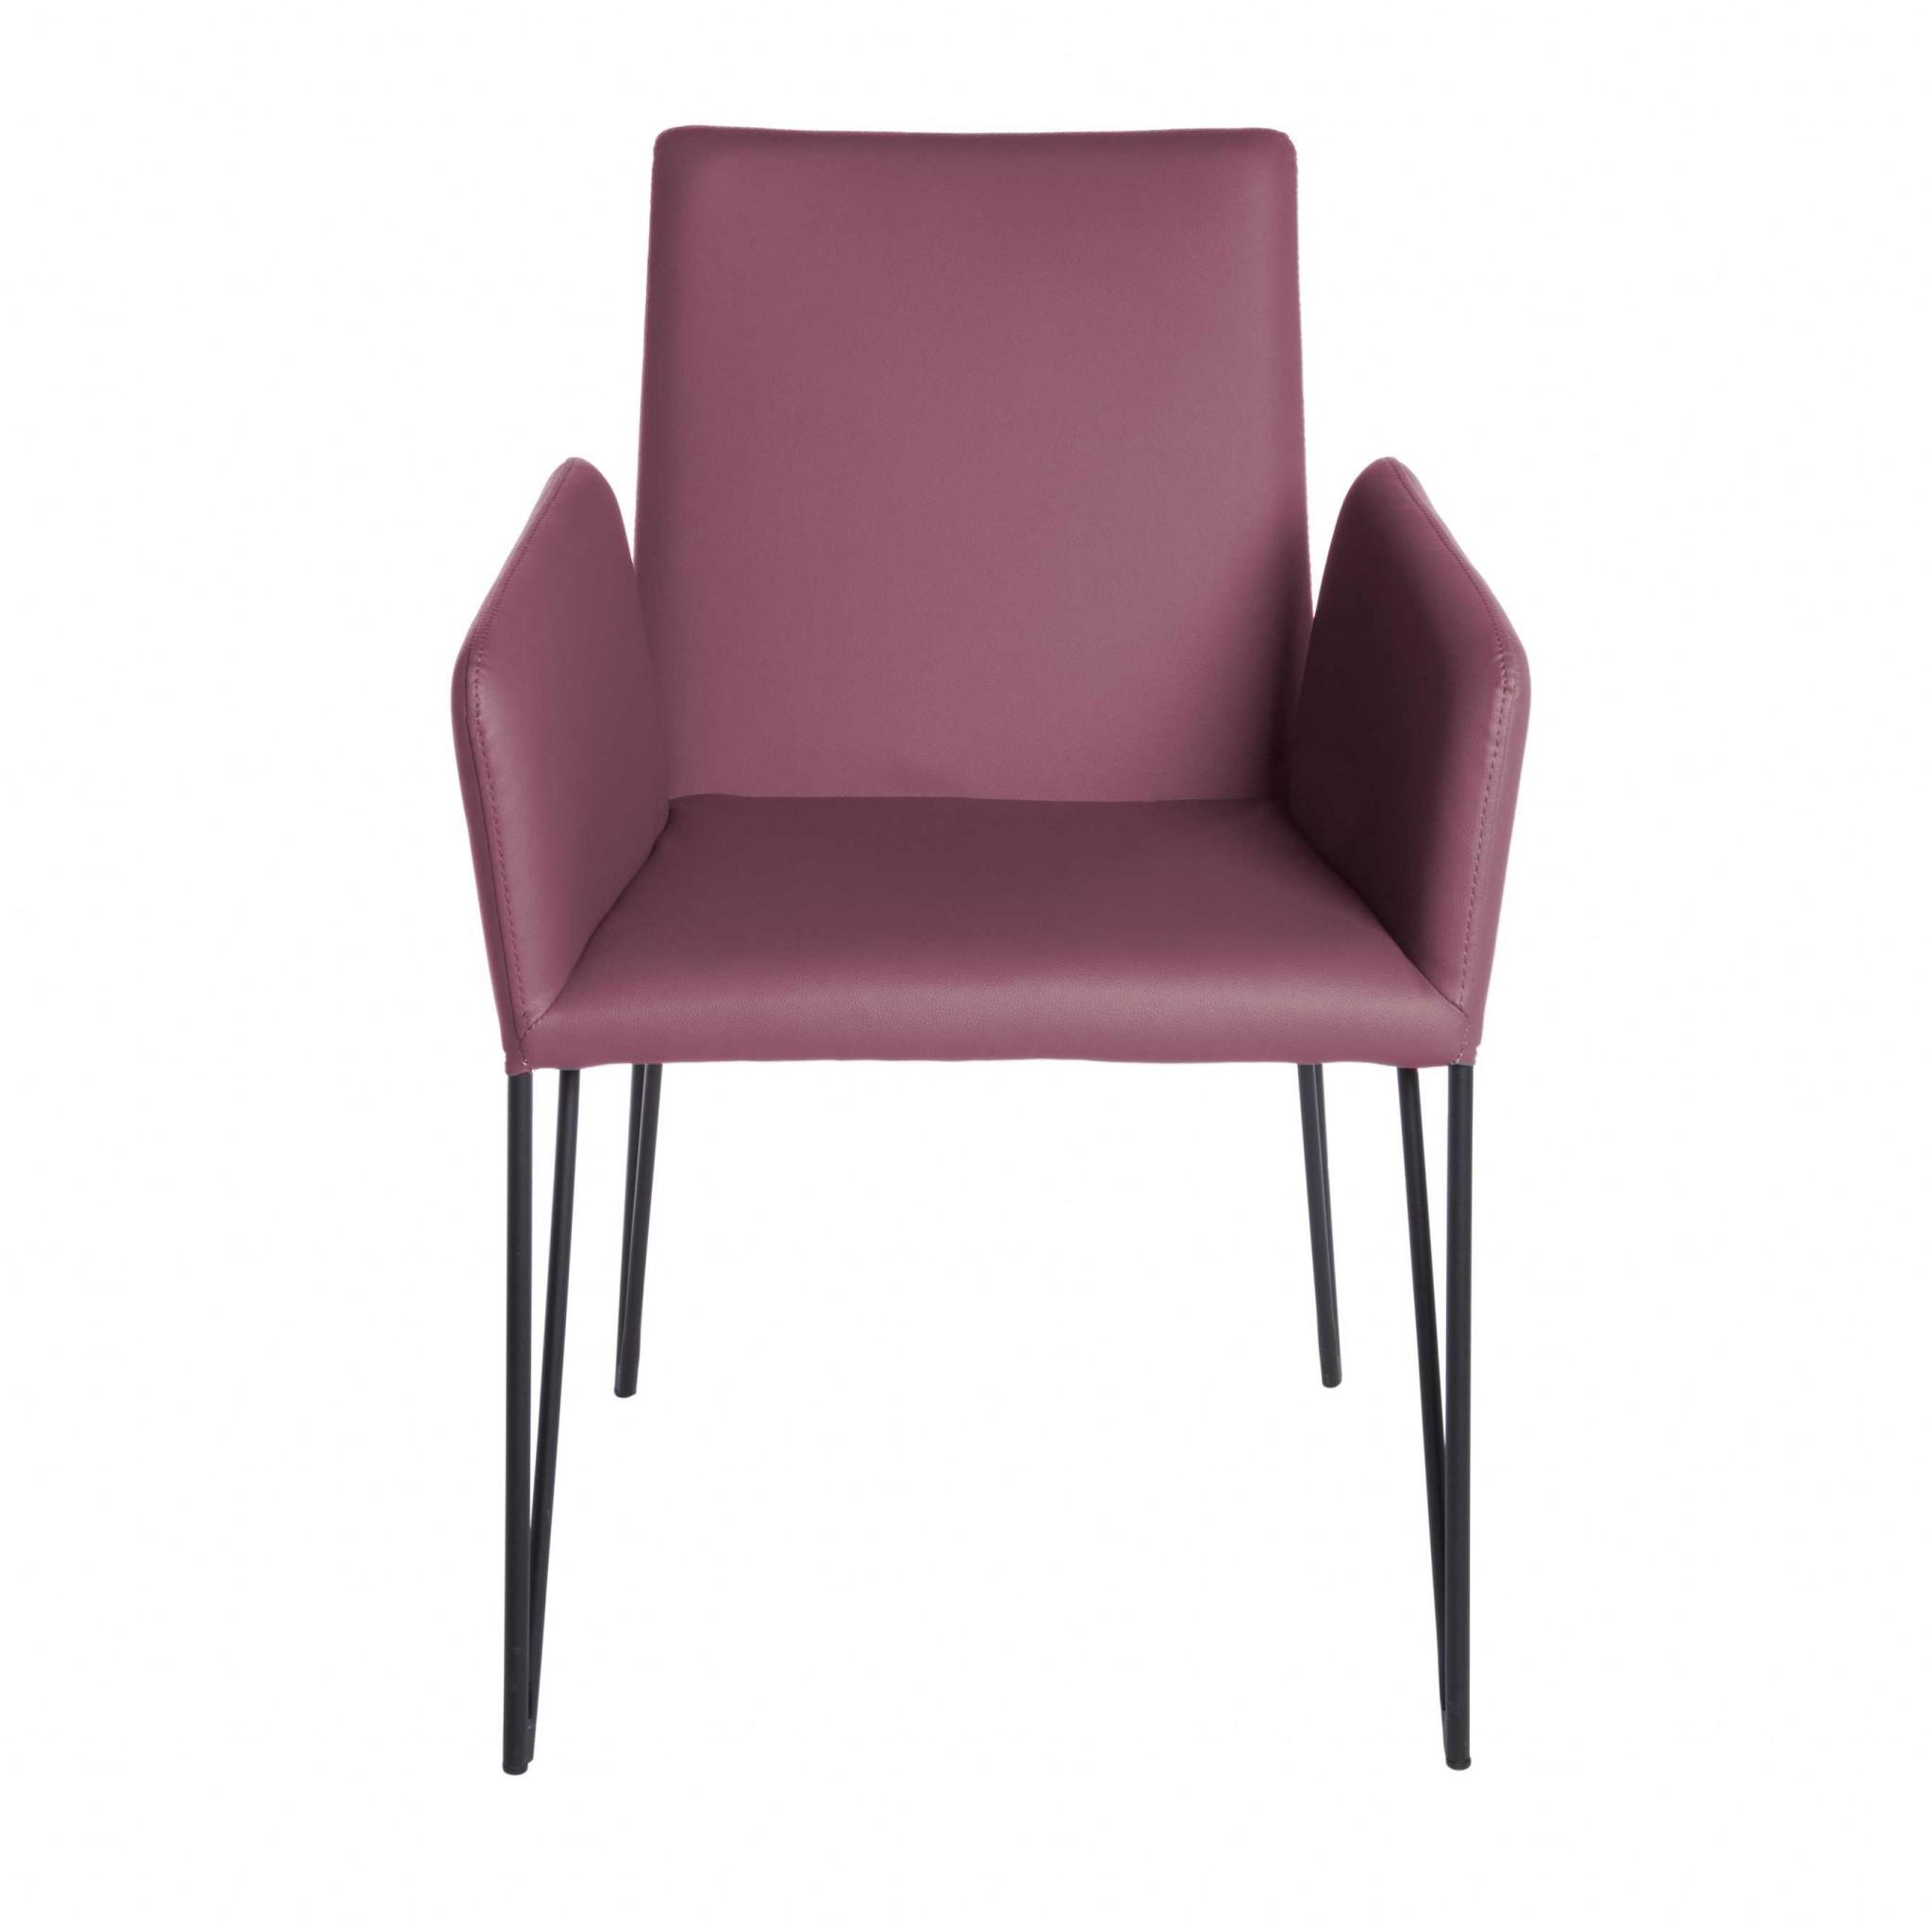 "22.45"" X 23.04"" X 35.63"" Purple Leatherette over Foam Arm Chair"